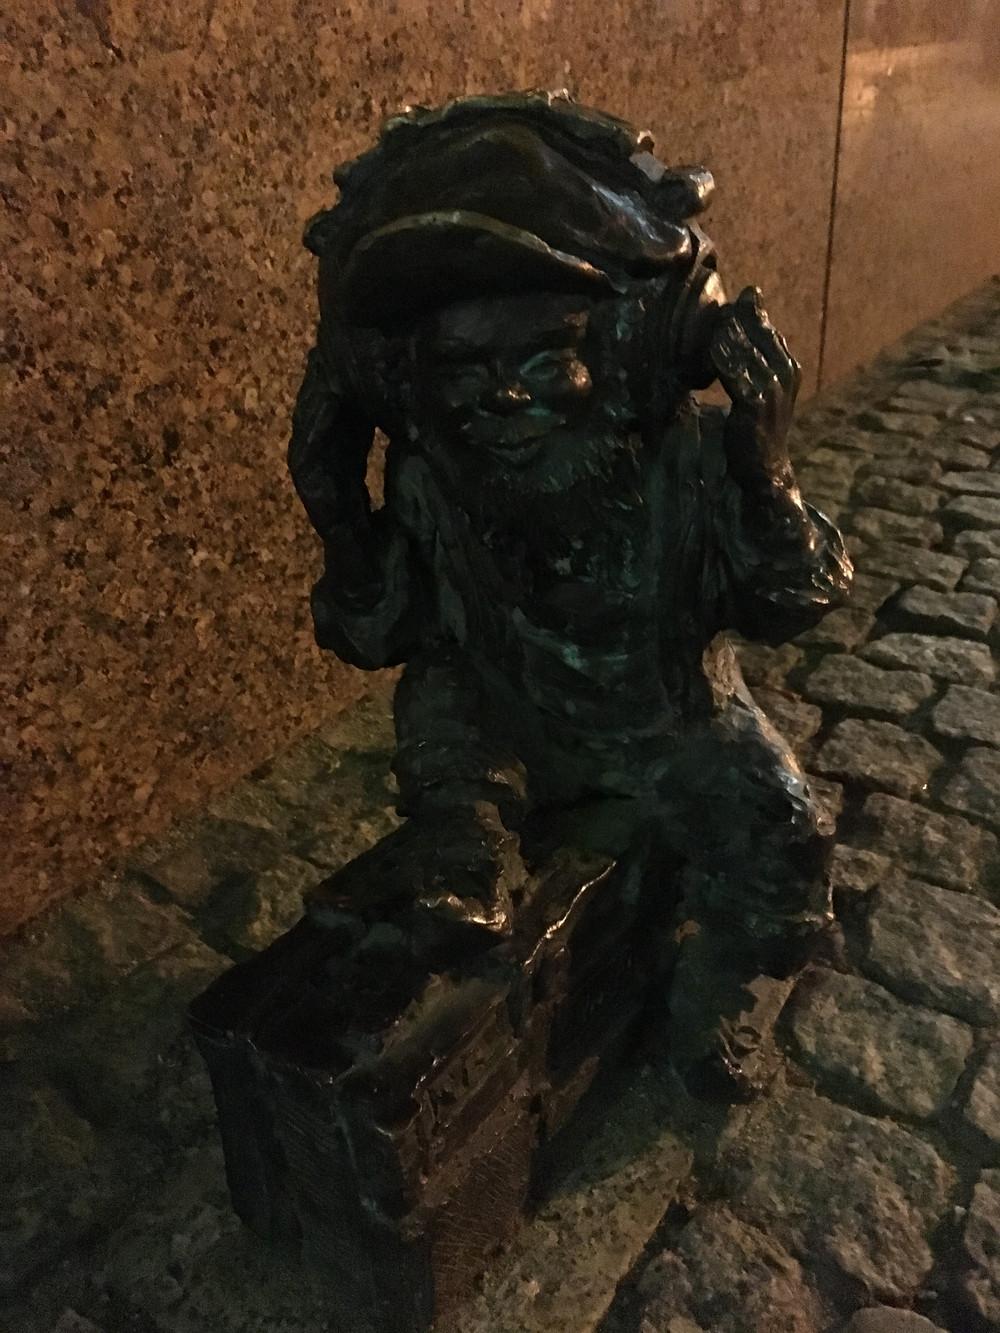 Wroclaw Dwarf, RMFek